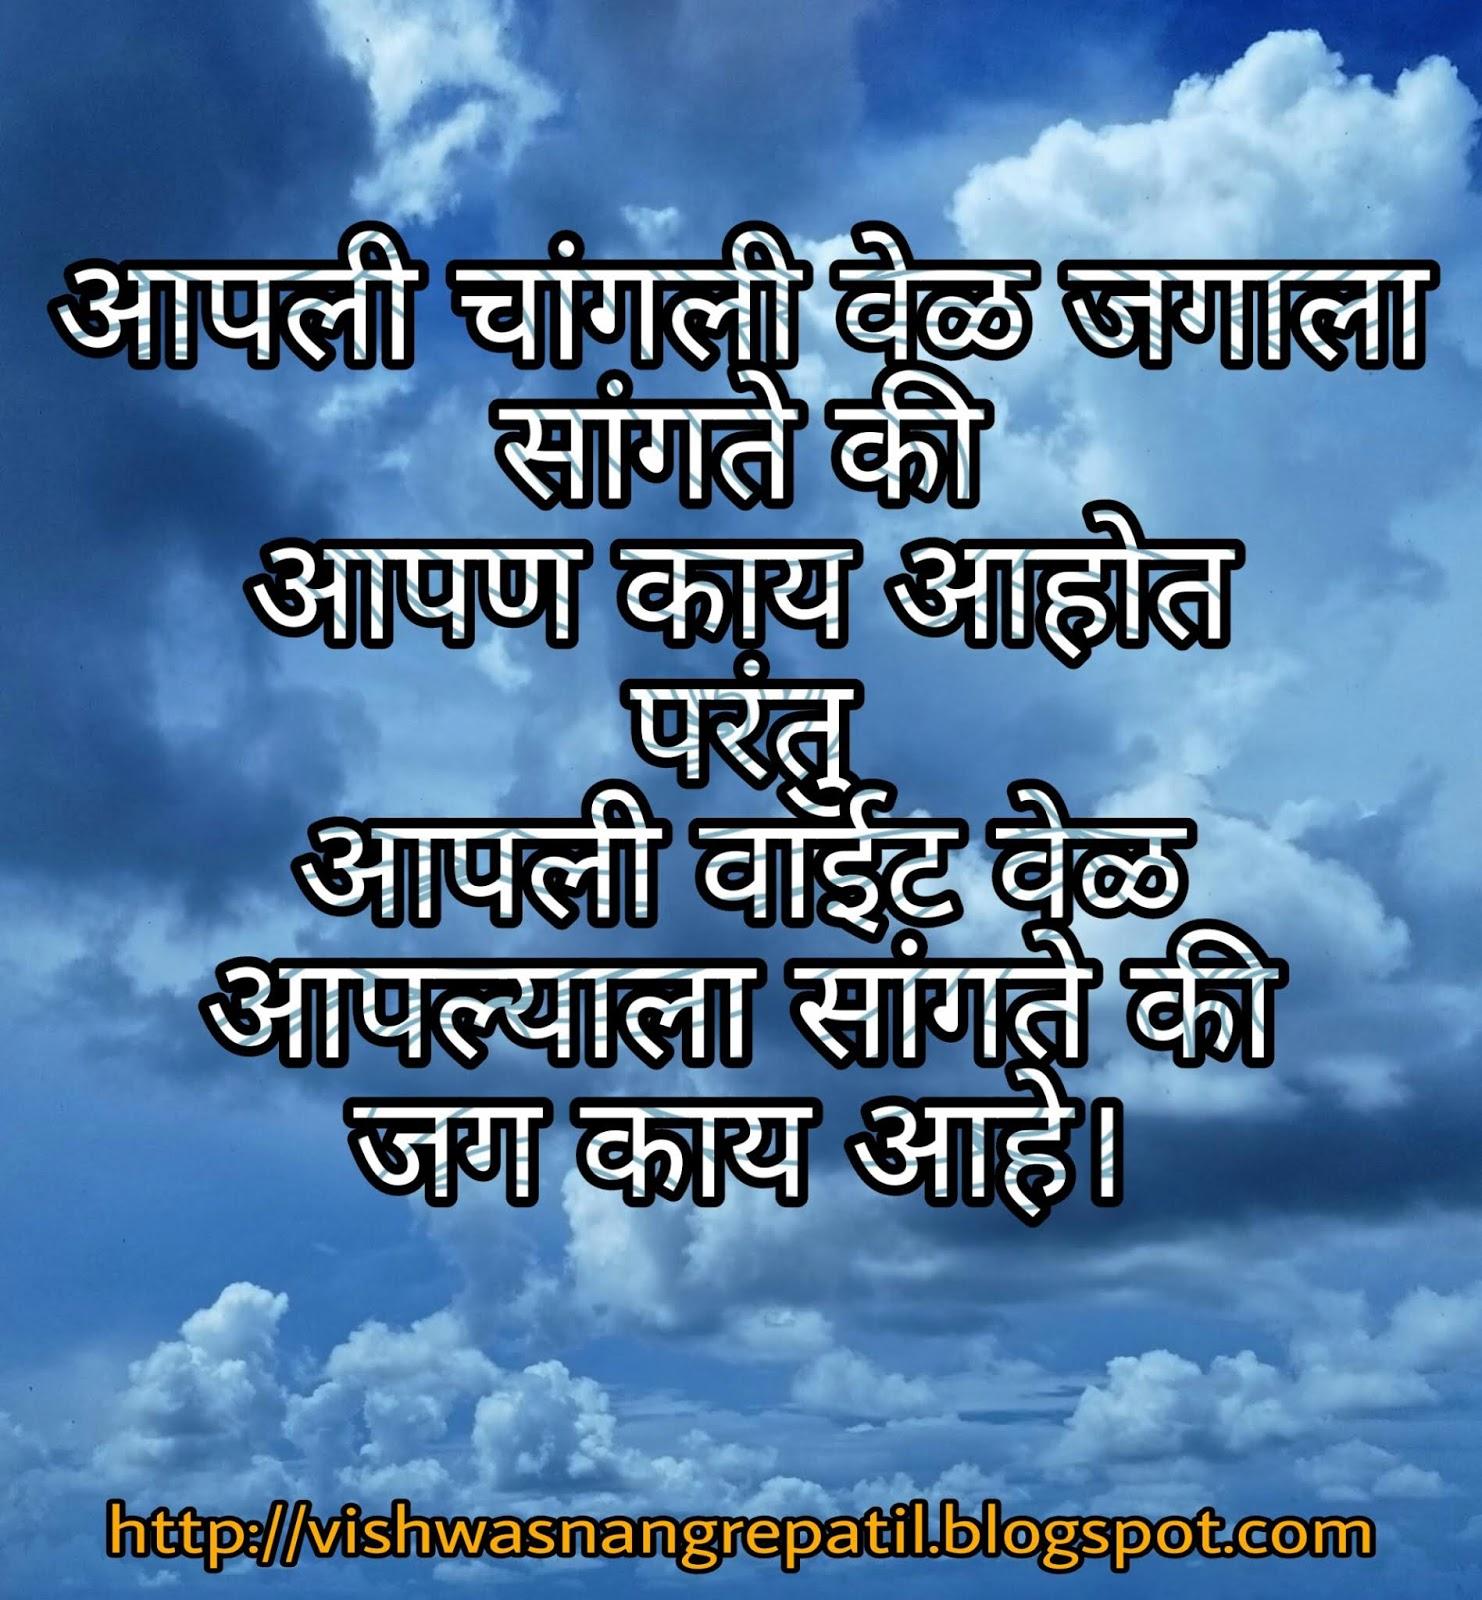 vishwas nangare patil motivational marathi status